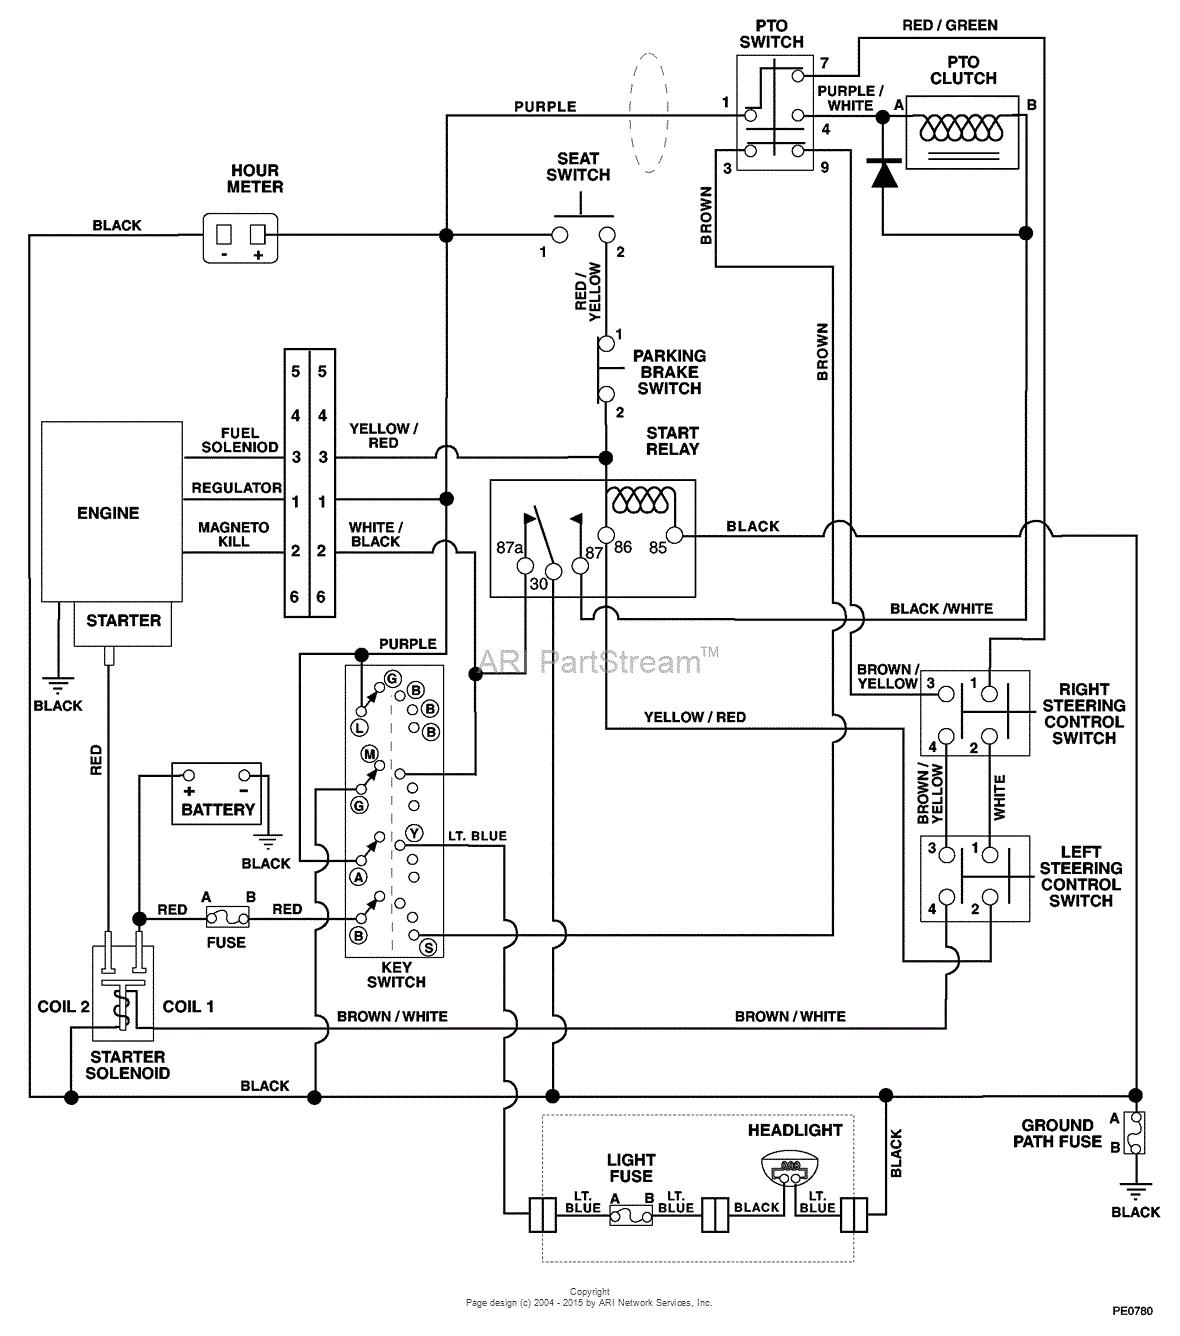 viper 791xv wiring diagram wiring schematic diagram 166 beamsys coviper 791xv wiring diagram wiring library viper